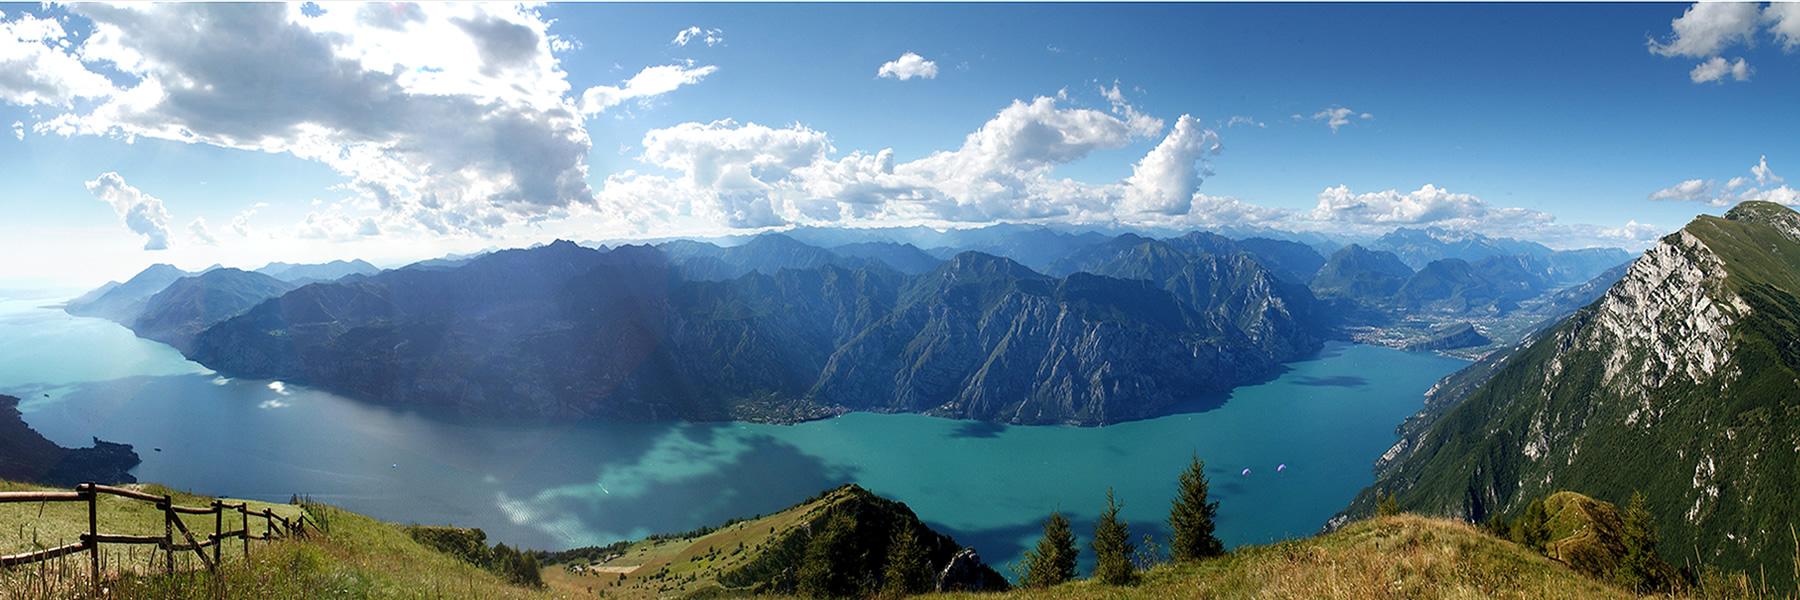 Италианските езера – една неземна красота